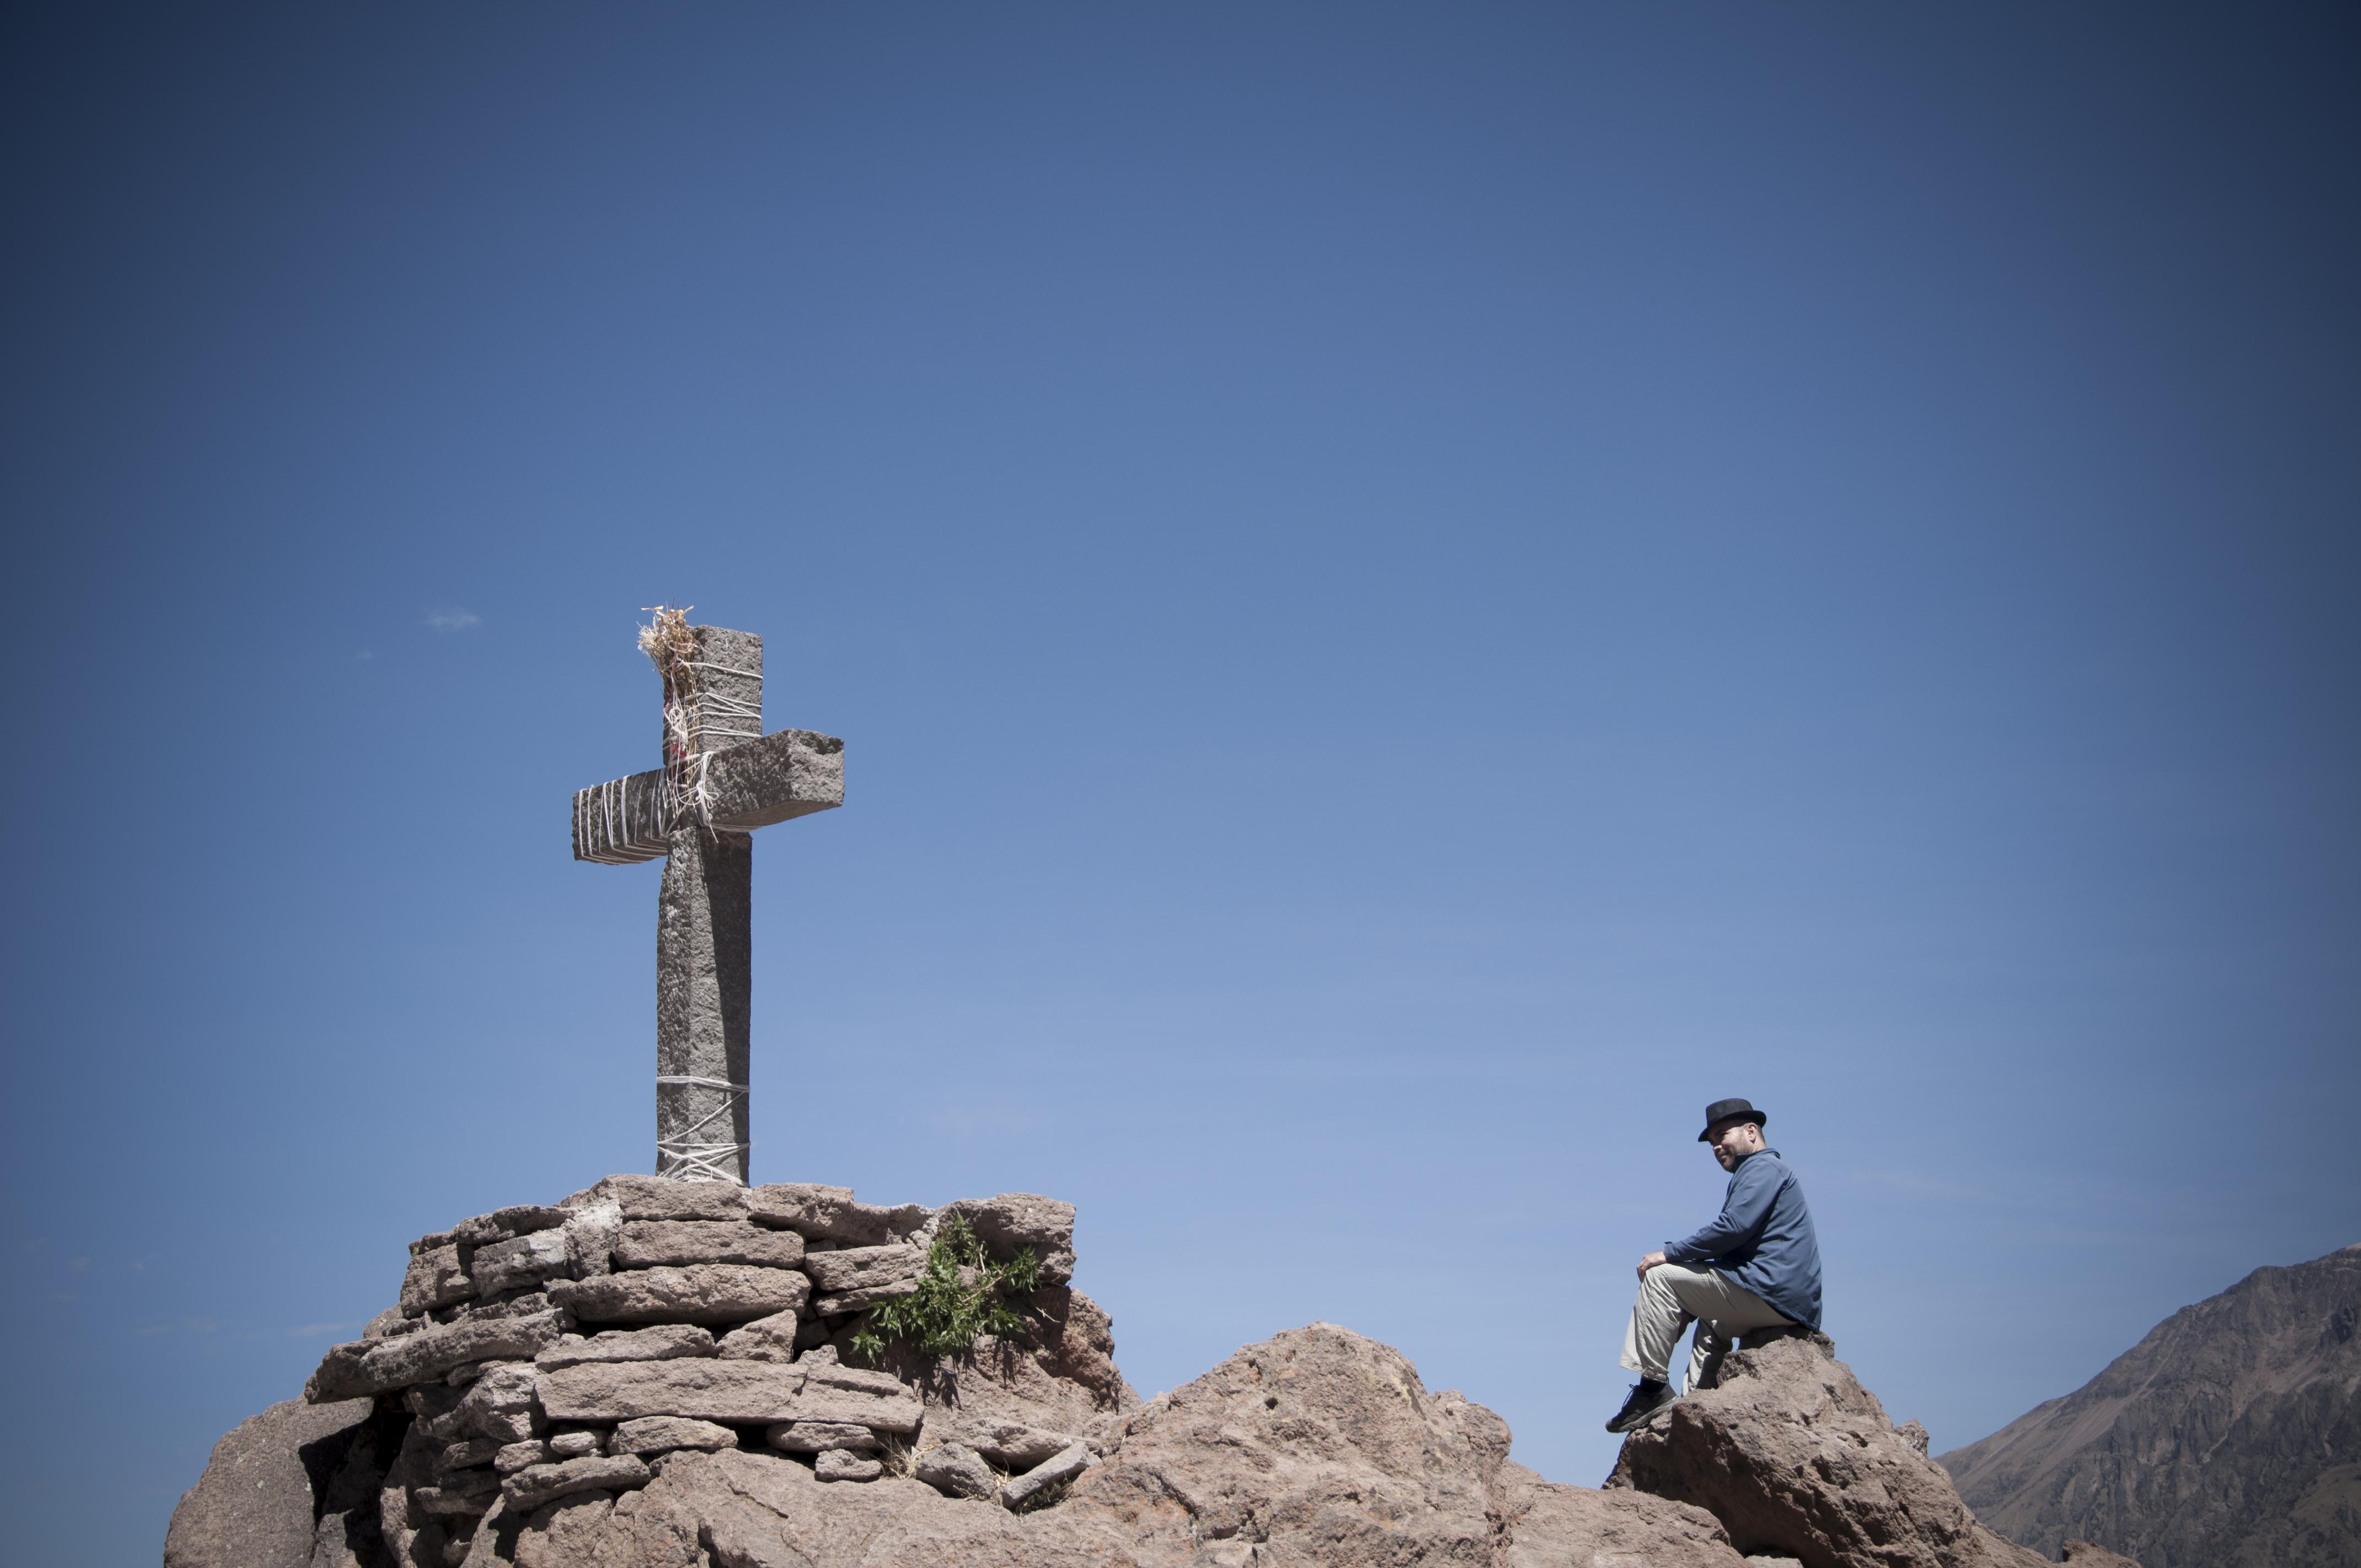 Peru 2013 Cañon del Colca Mirador del condor1